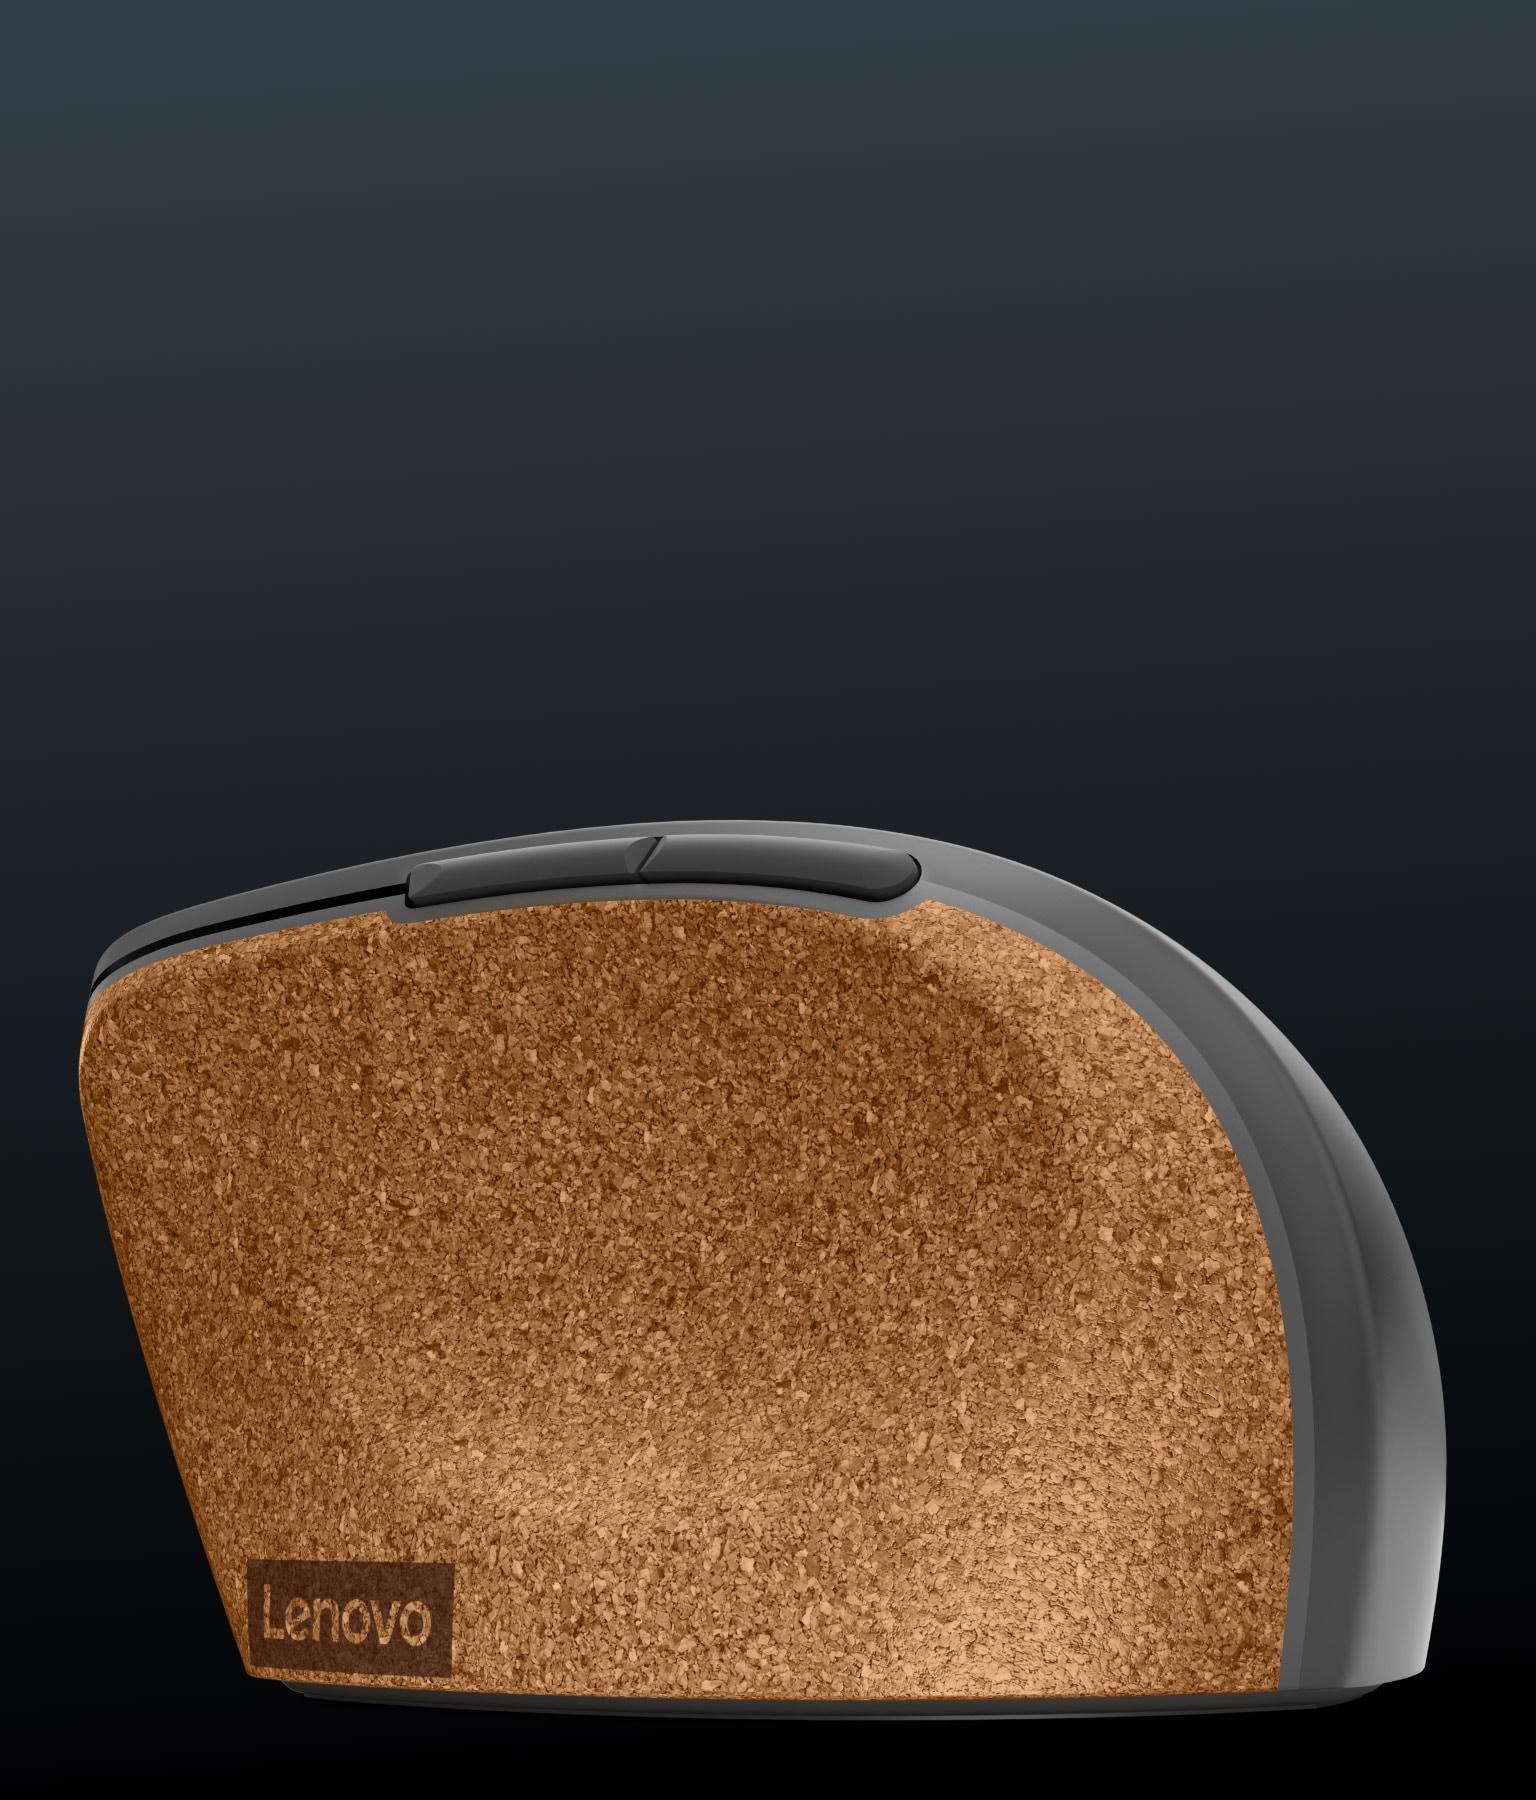 Lenovo Go Wireless Vertical Mouse left side profile